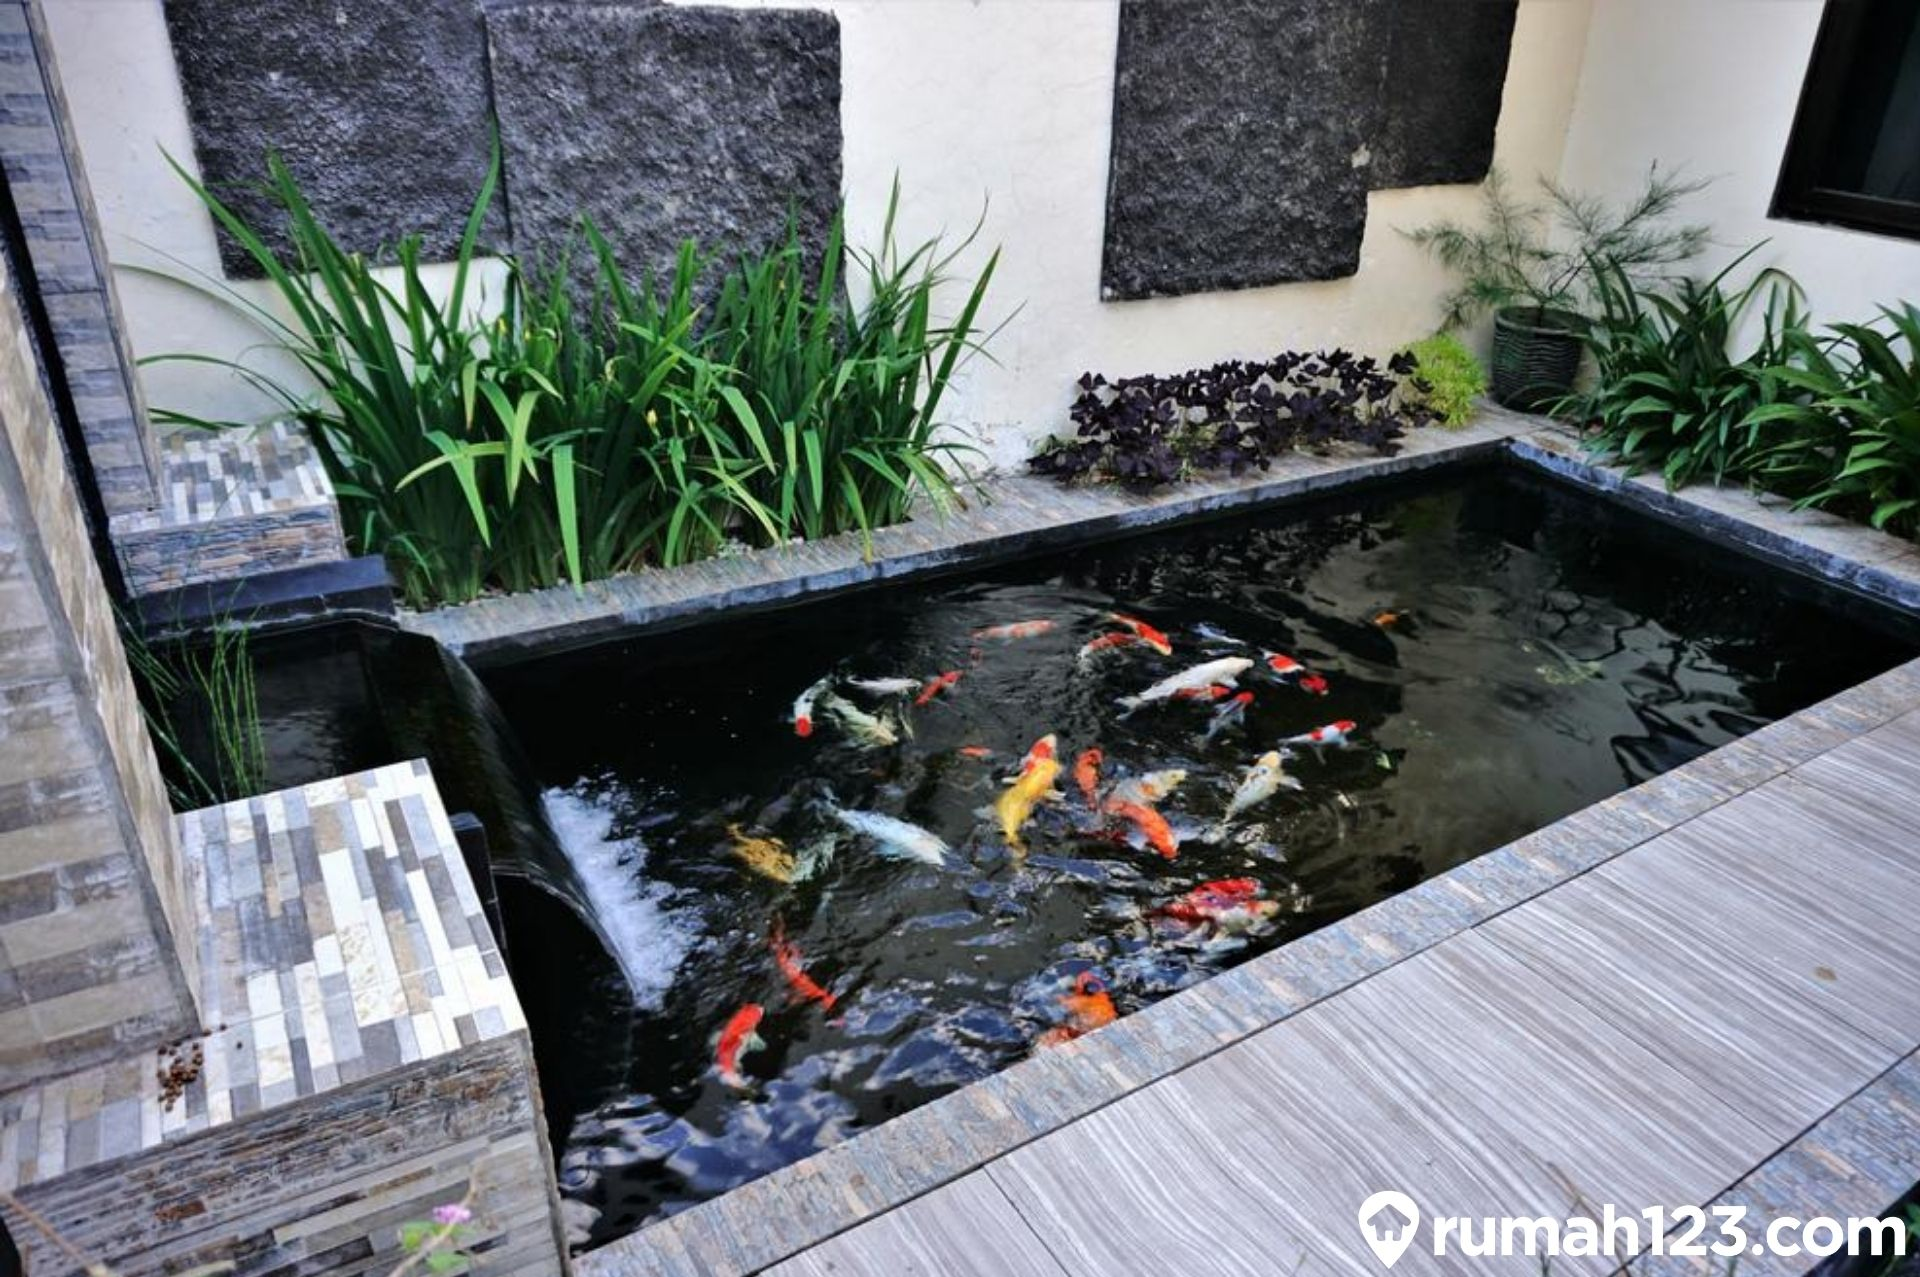 9 Inspirasi Kolam Ikan Minimalis Nan Estetis Di Rumah Rumah123 Com